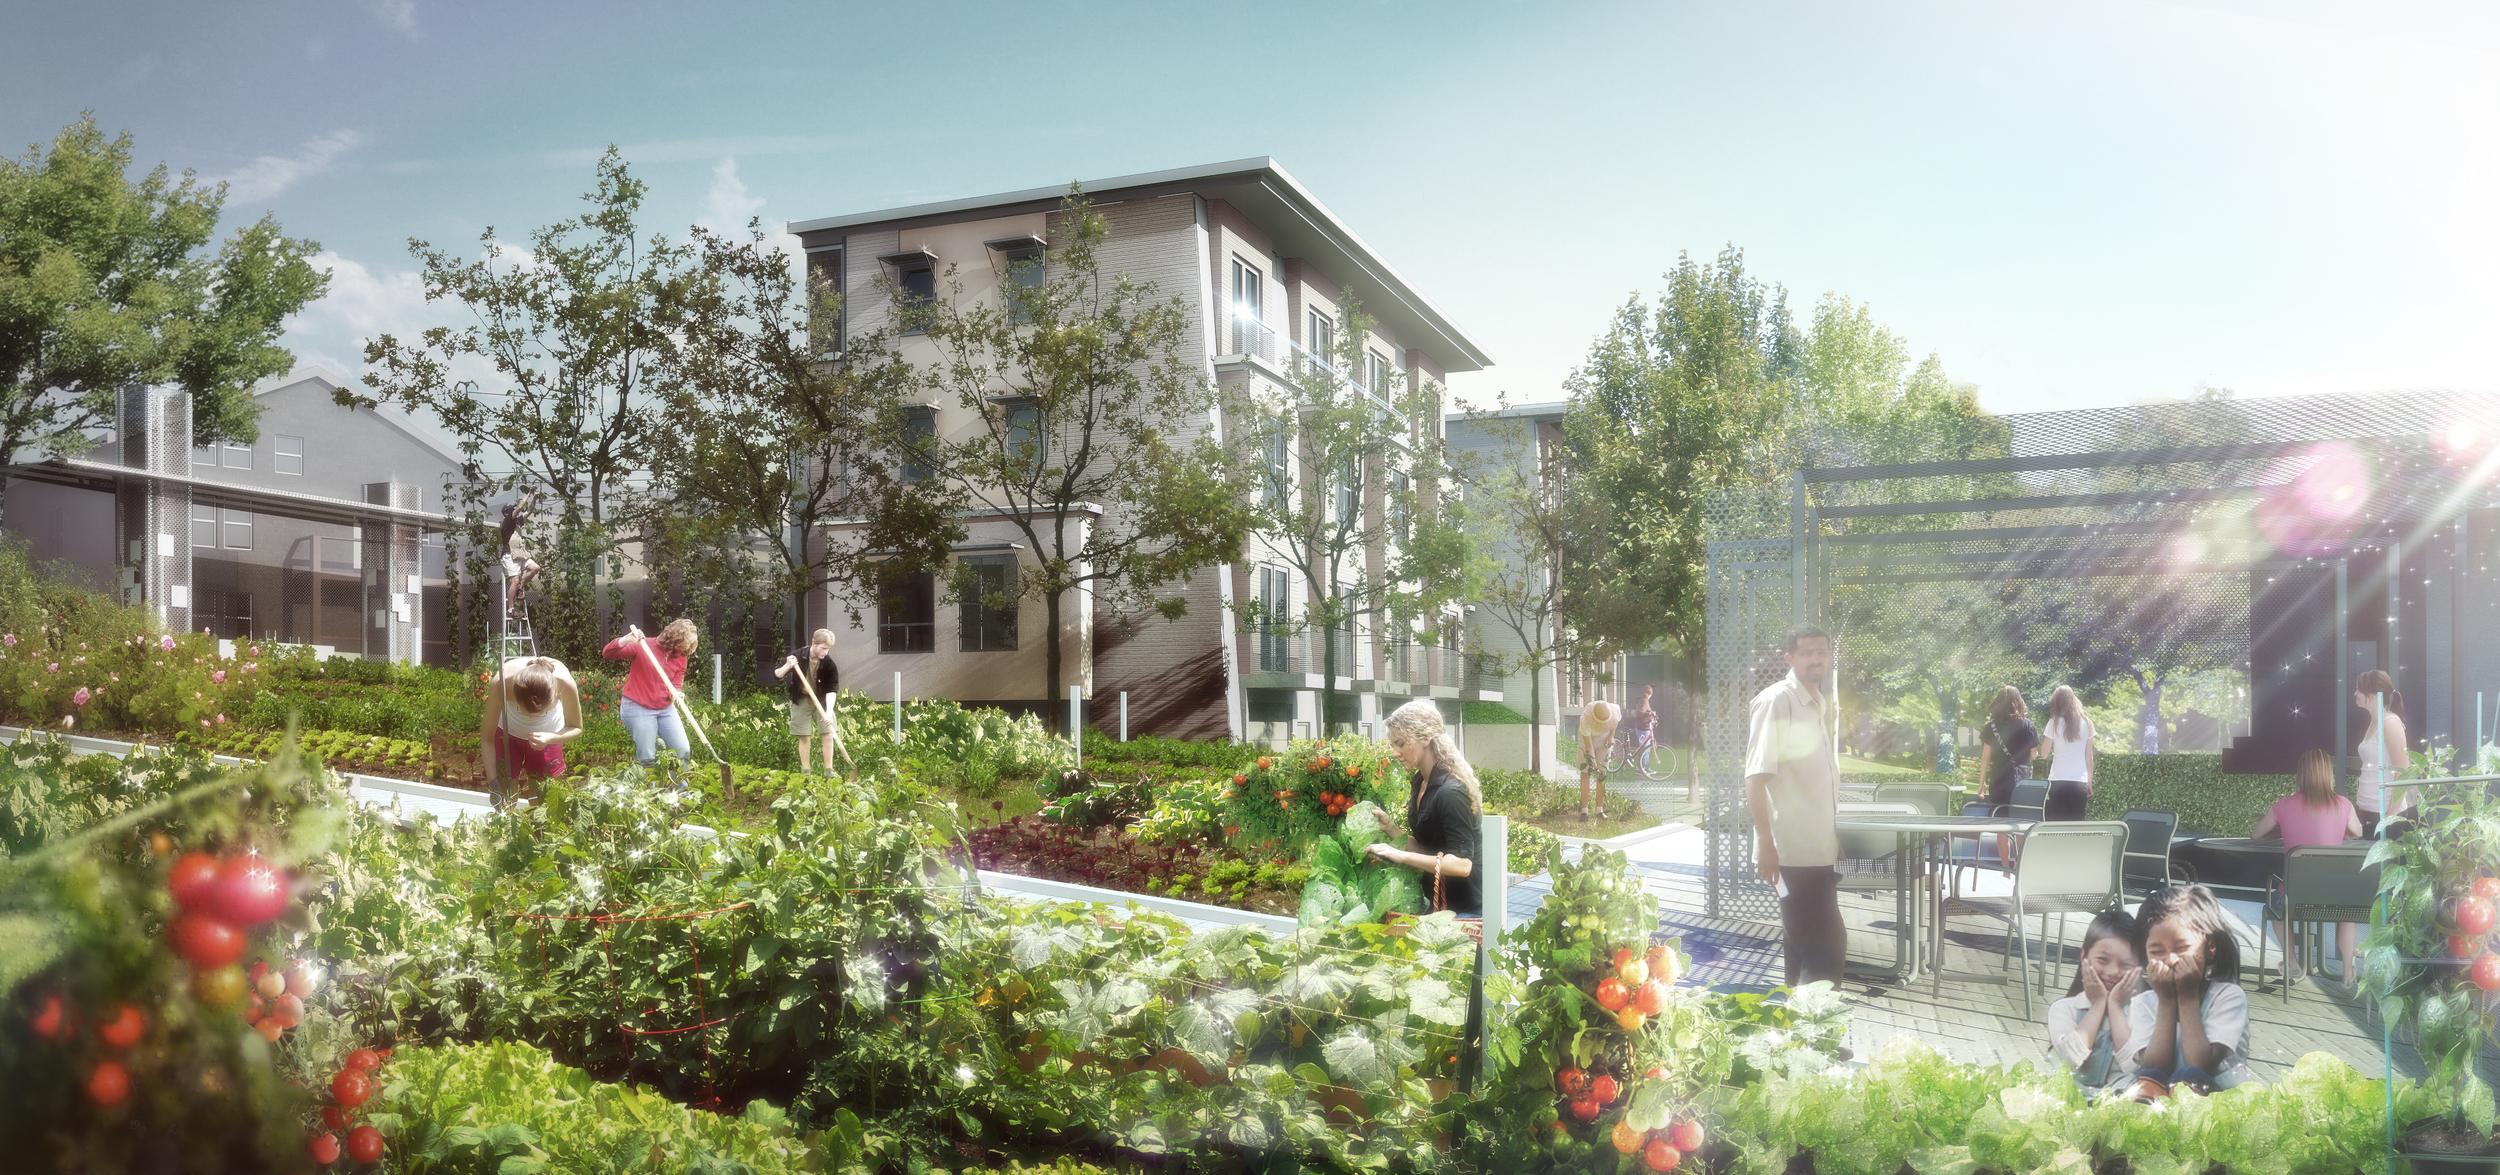 Community-Garden-View03.jpg